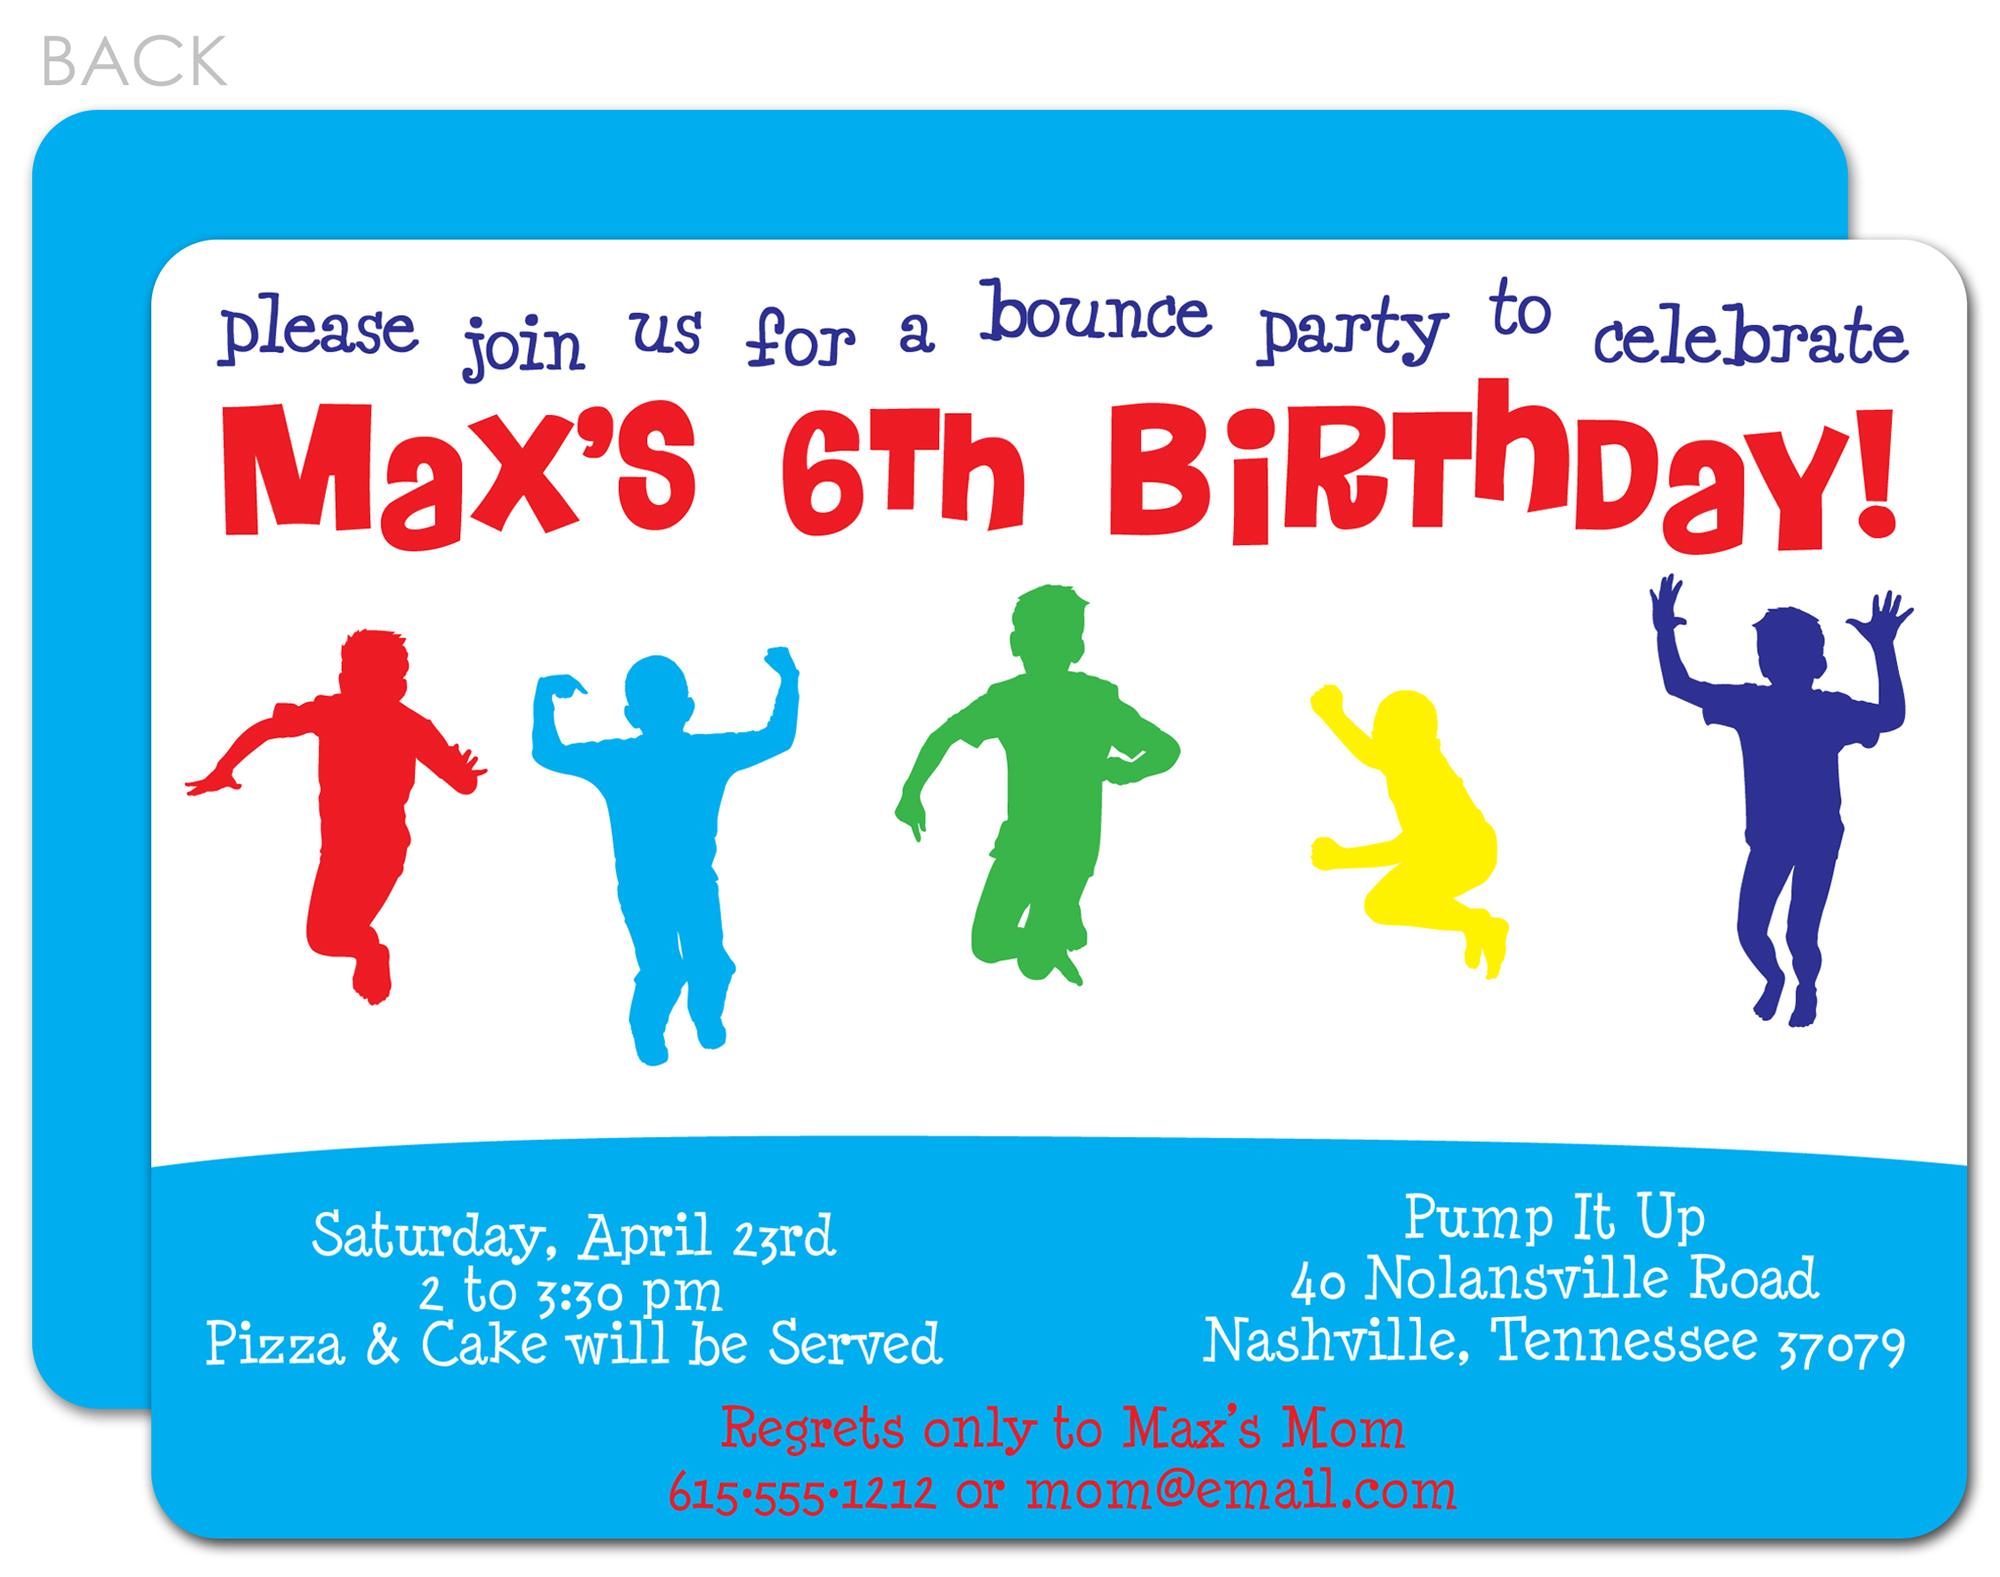 Party Invitations Free, Free Printable Birthday Party Invitations ...